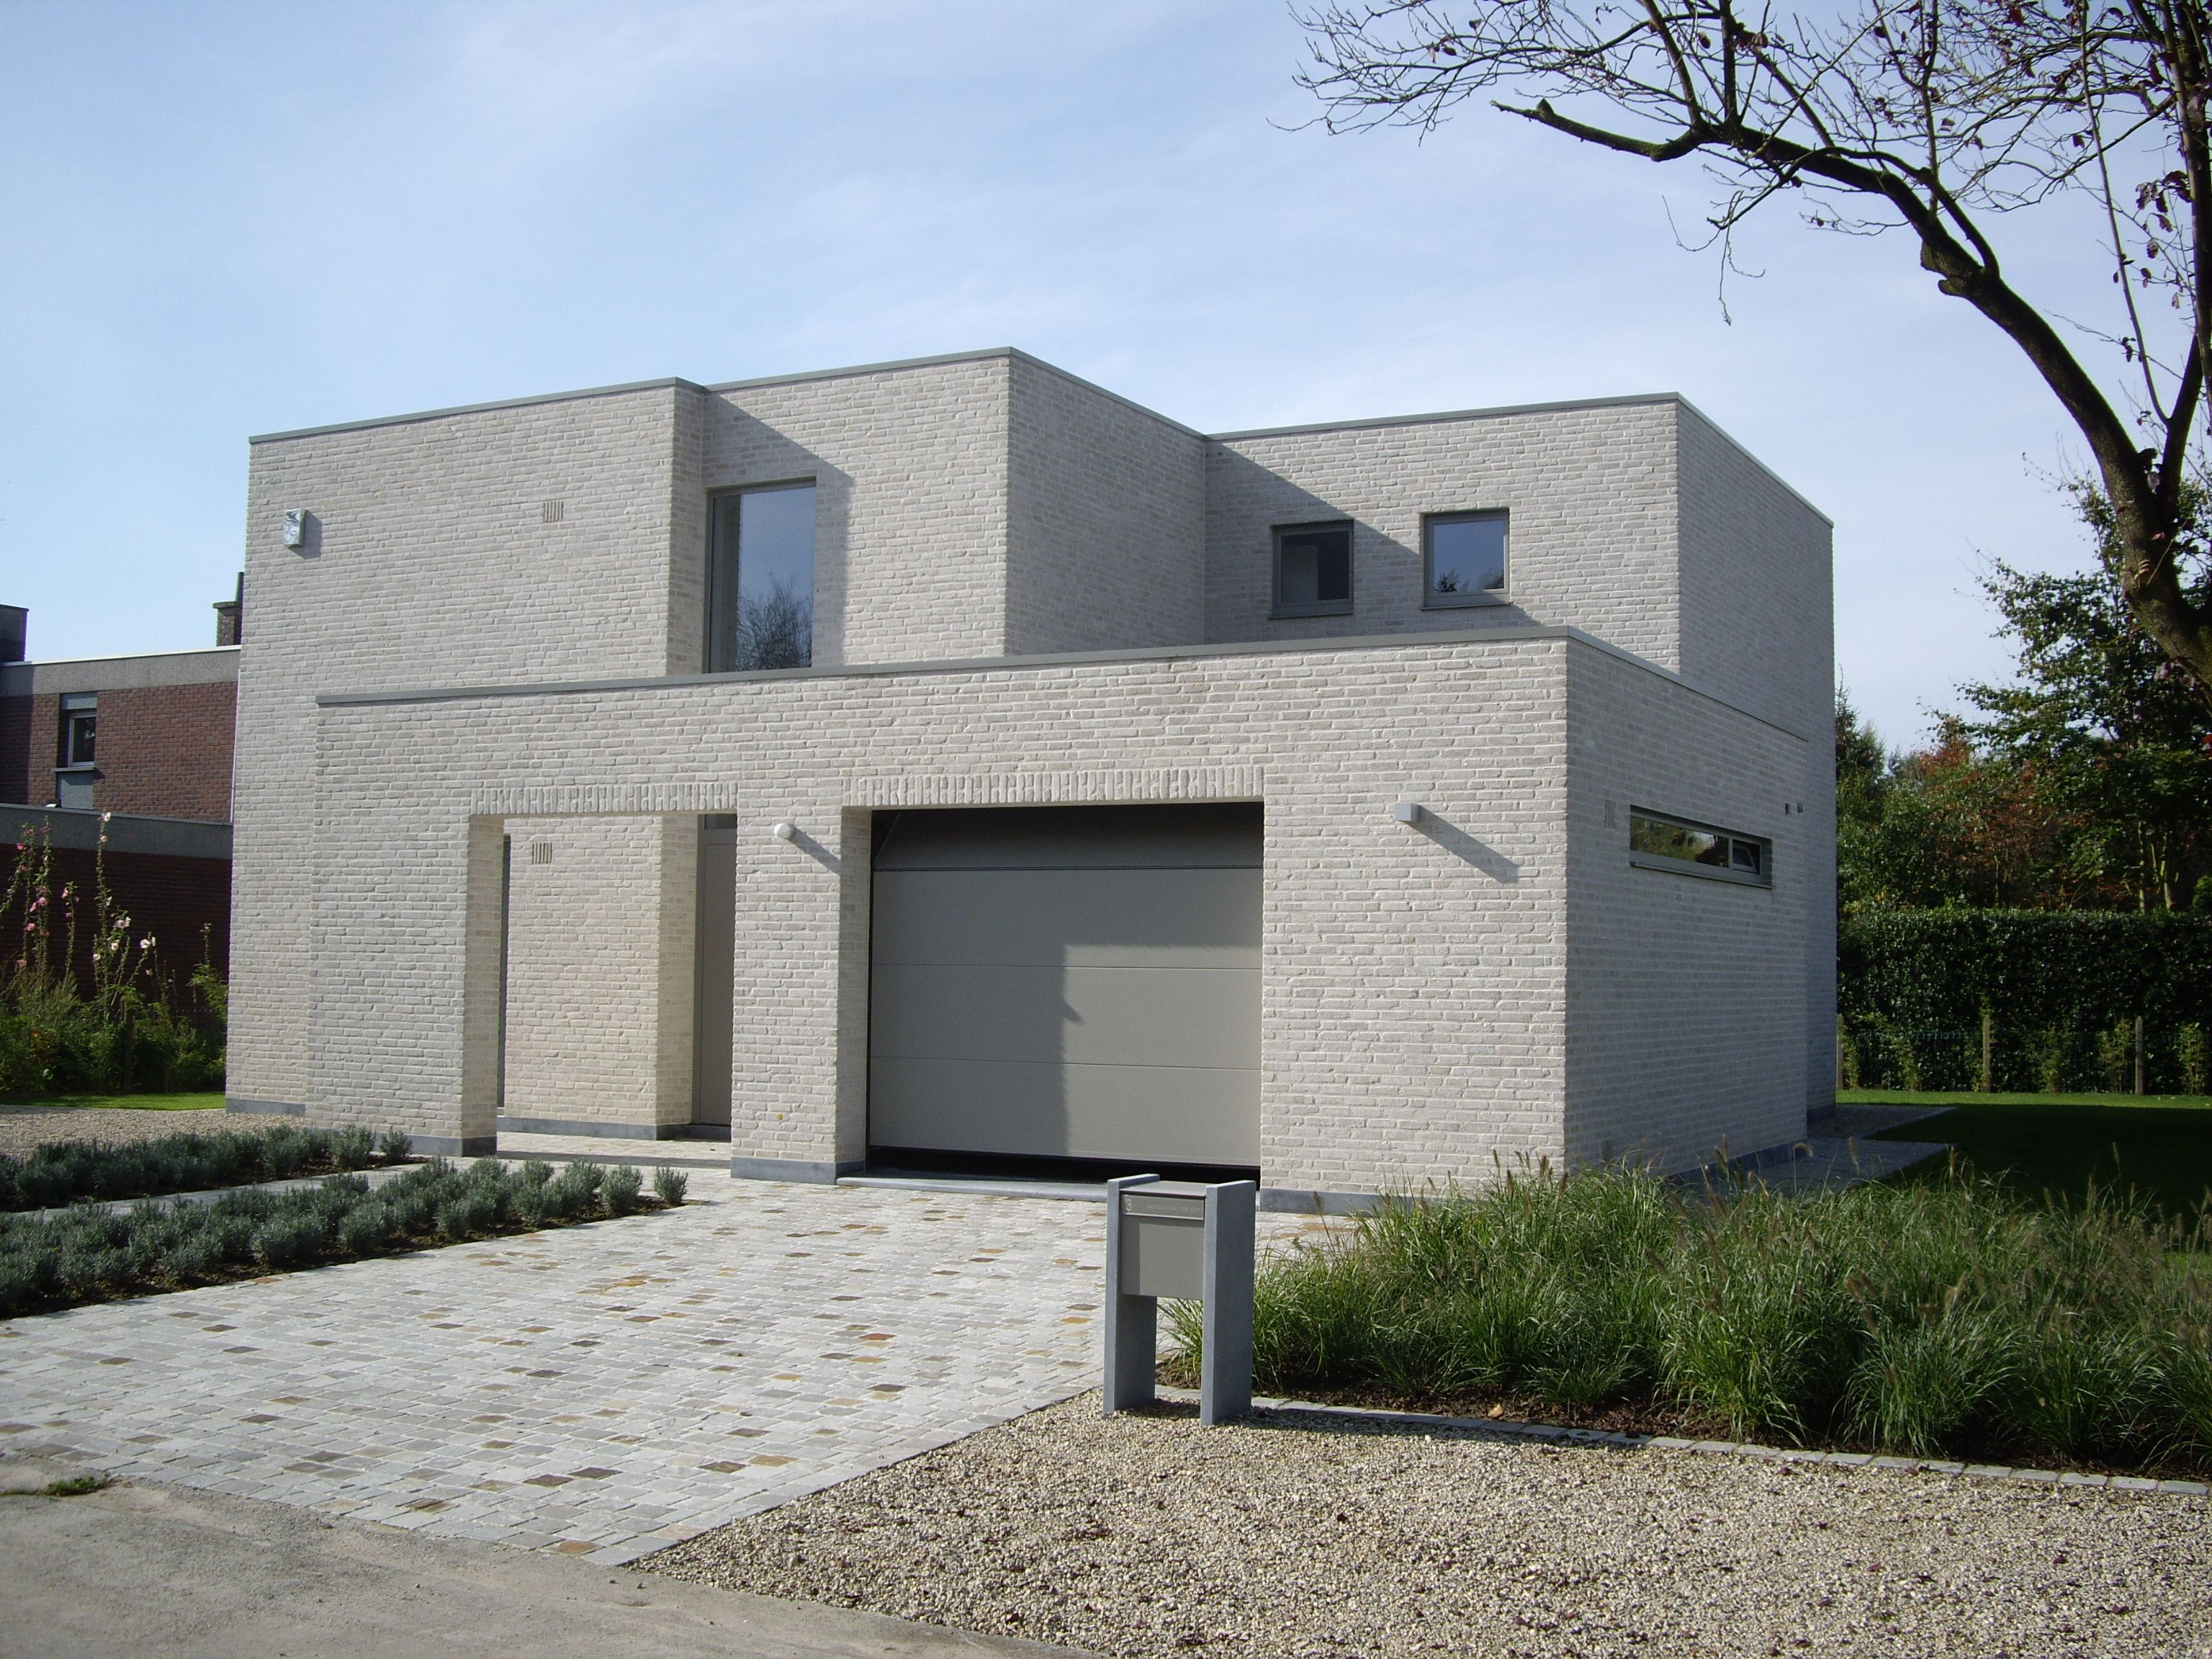 Priv woning drongen architect wouter cassiman architect wouter cassiman - Zeer moderne woning ...